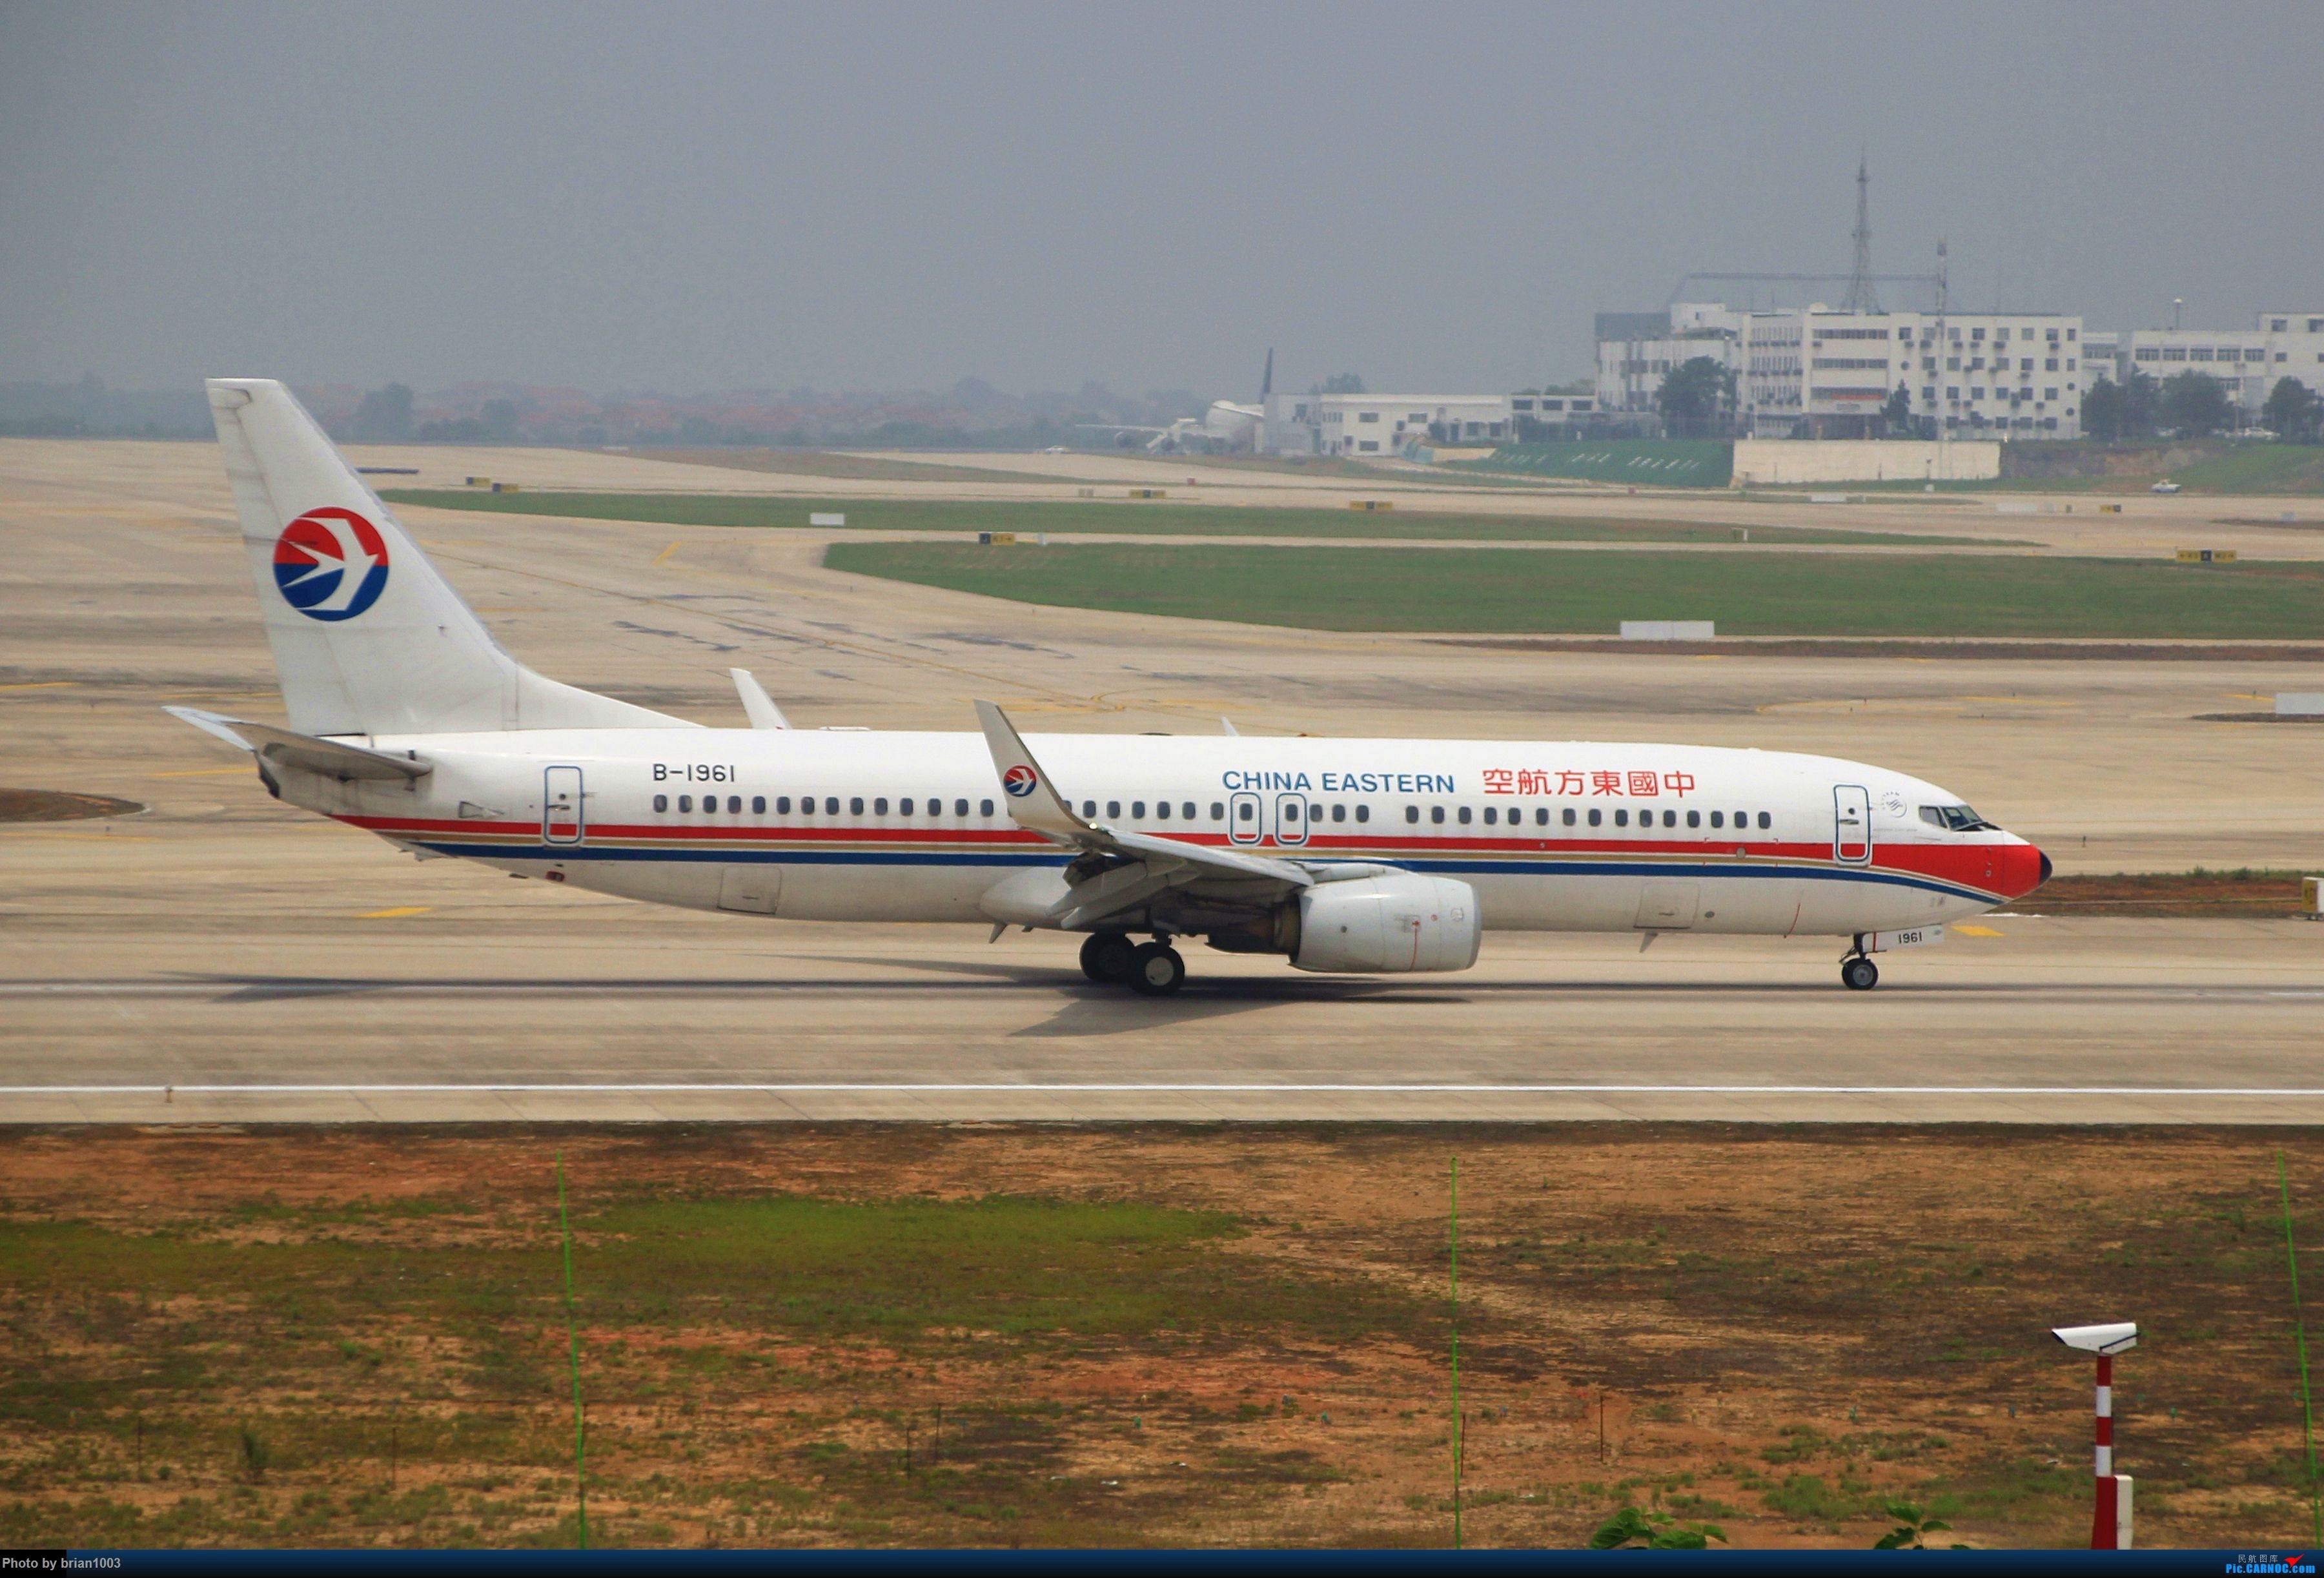 Re:[原创]WUH武汉天河机场拍机之二跑最后忙碌时 BOEING 737-800 B-1961 中国武汉天河国际机场